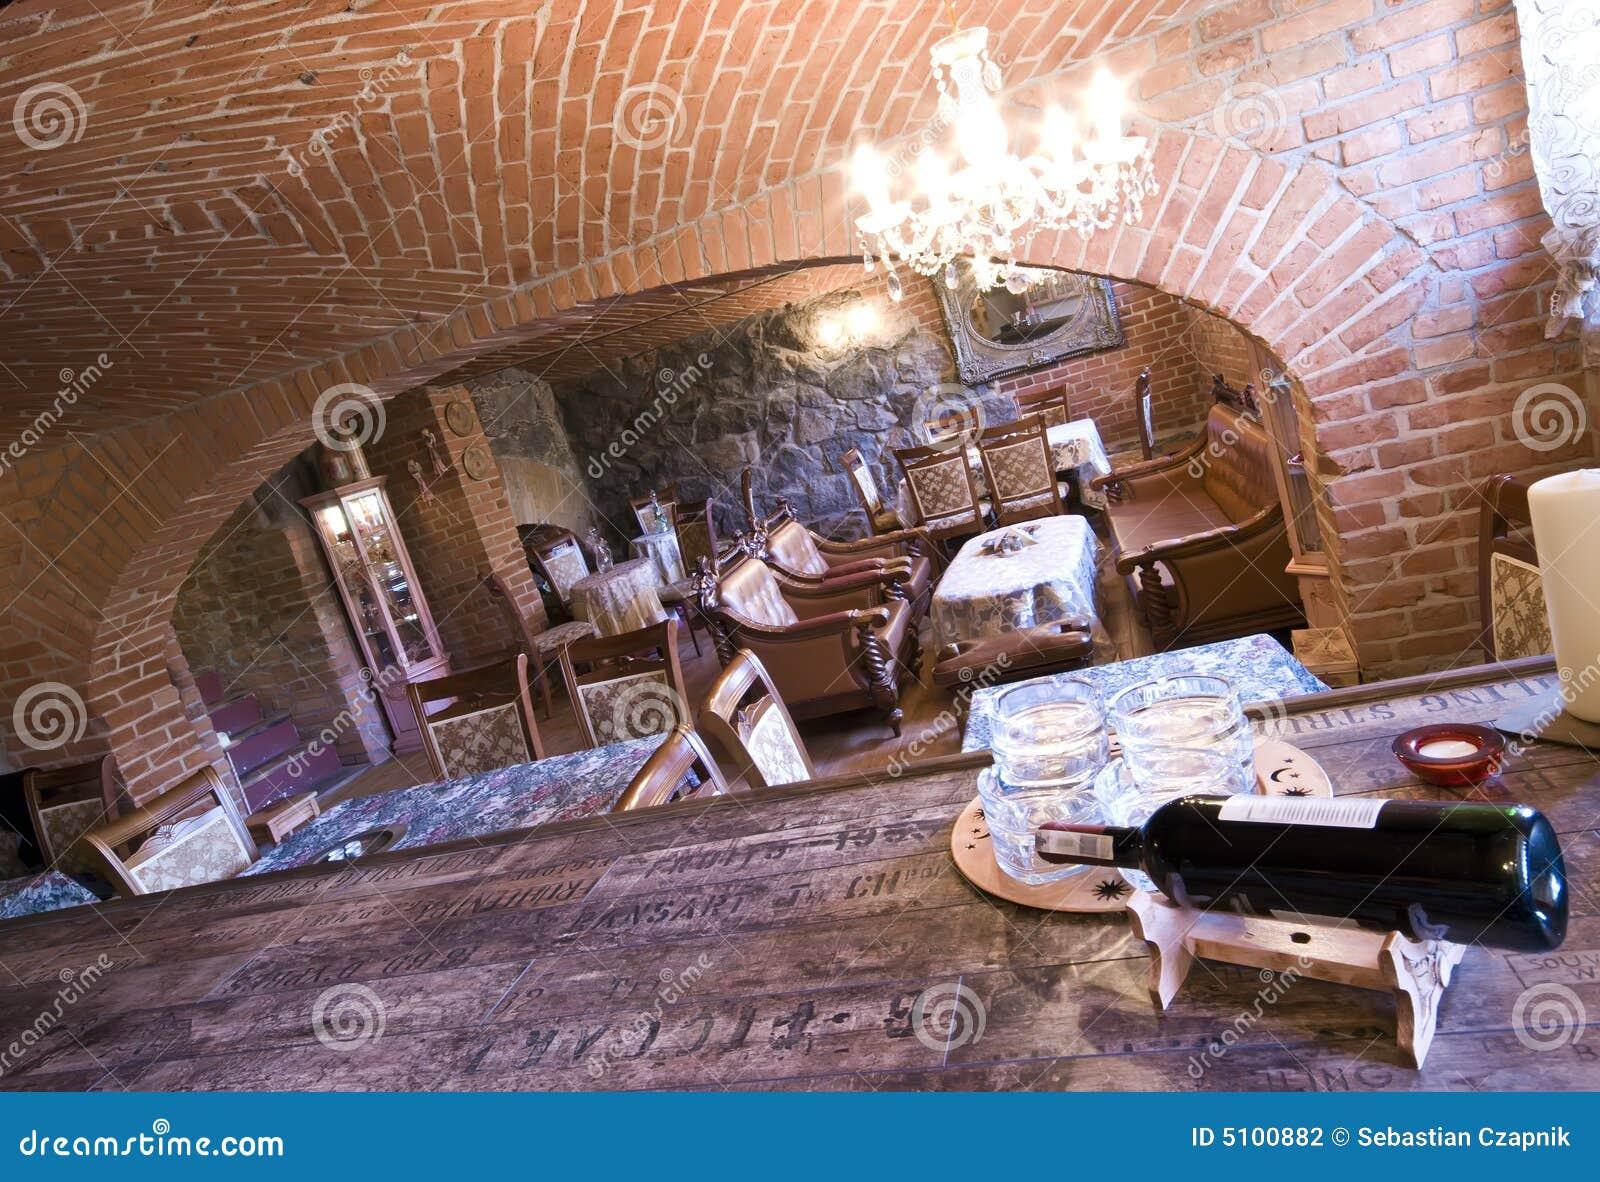 Restaurant In Brick Basement Stock Photography Image  : restaurant brick basement 5100882 from www.dreamstime.com size 1300 x 978 jpeg 238kB